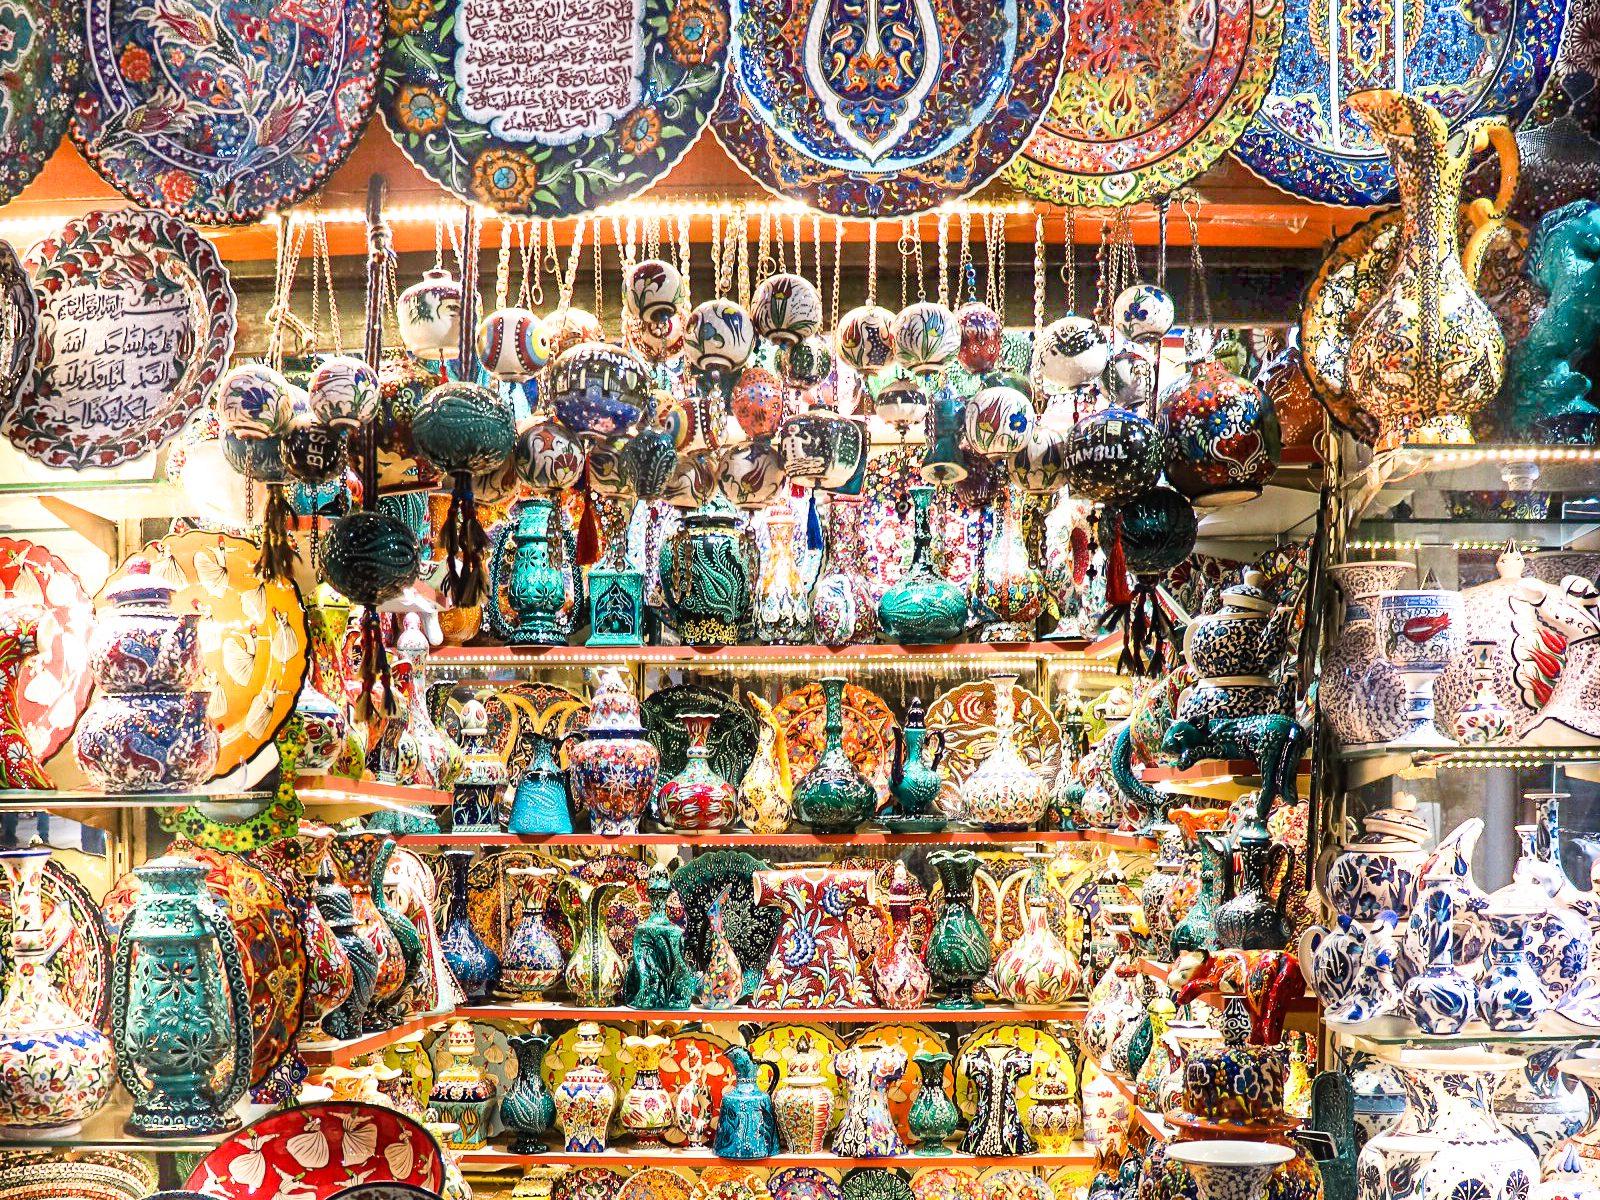 Ceramics at the Grand Bazaar, Istanbul